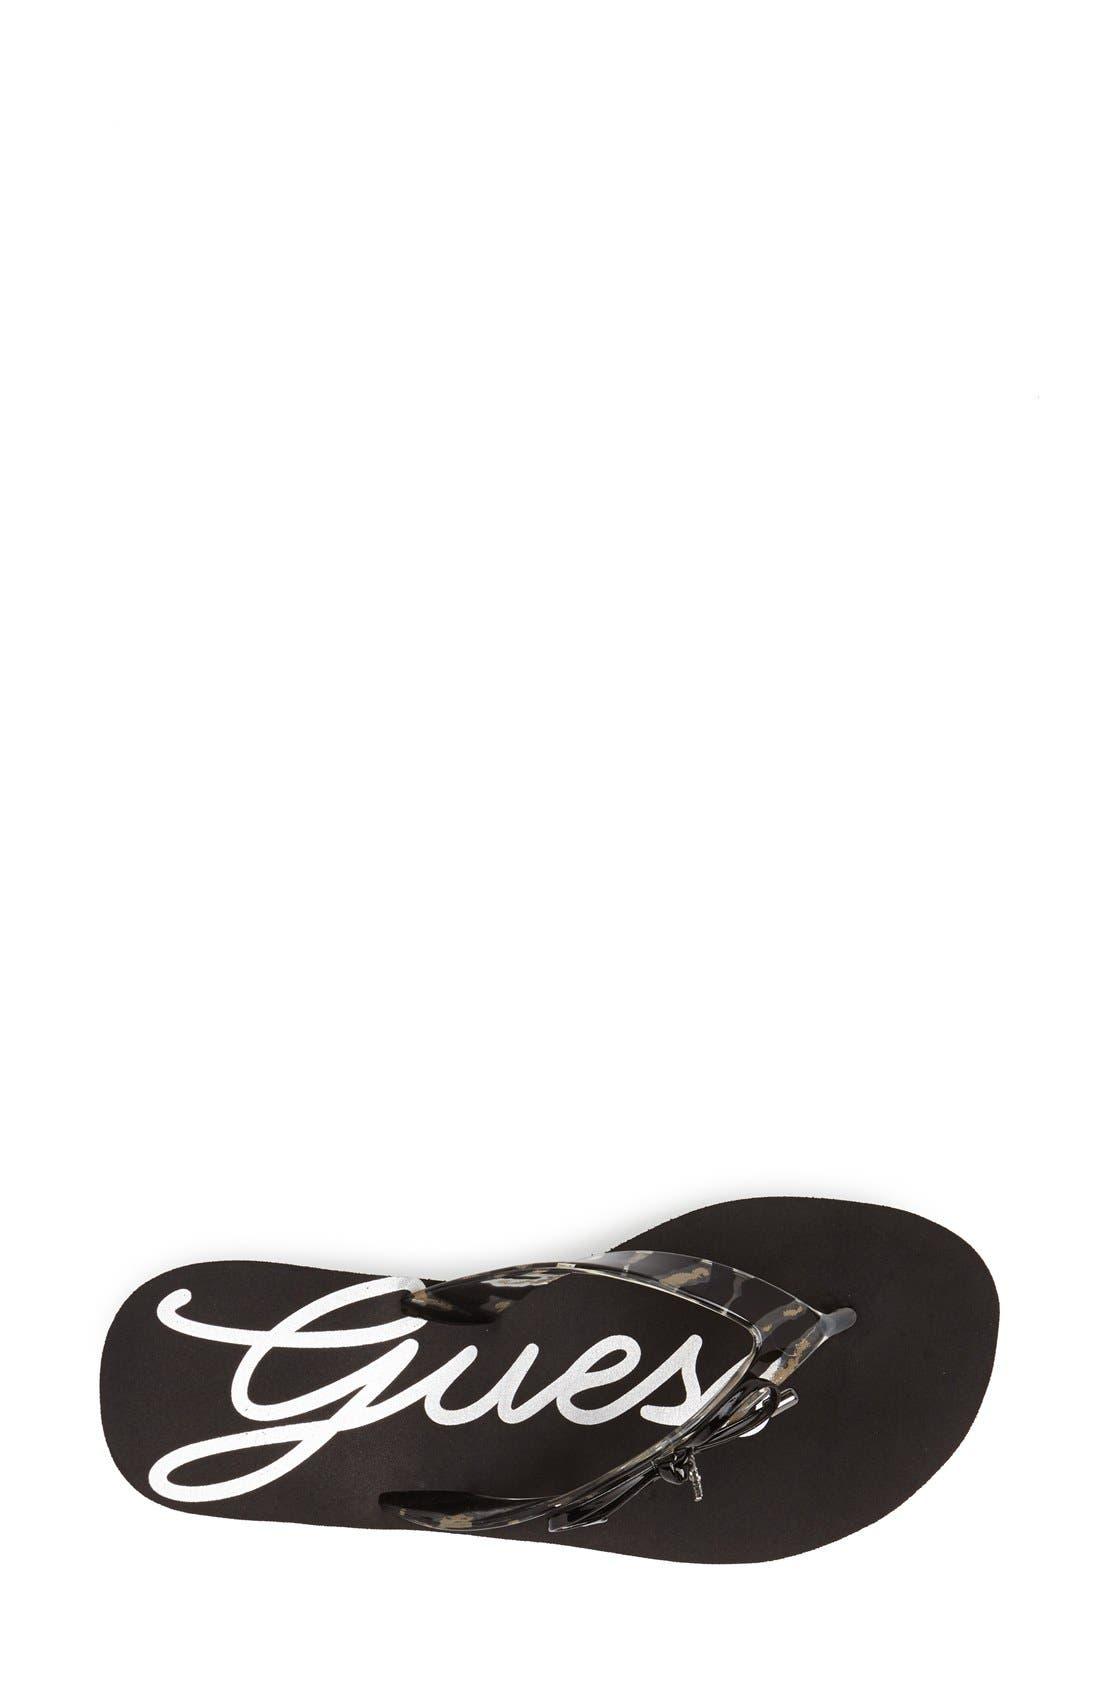 Alternate Image 3  - Guess 'Syona' Sandal